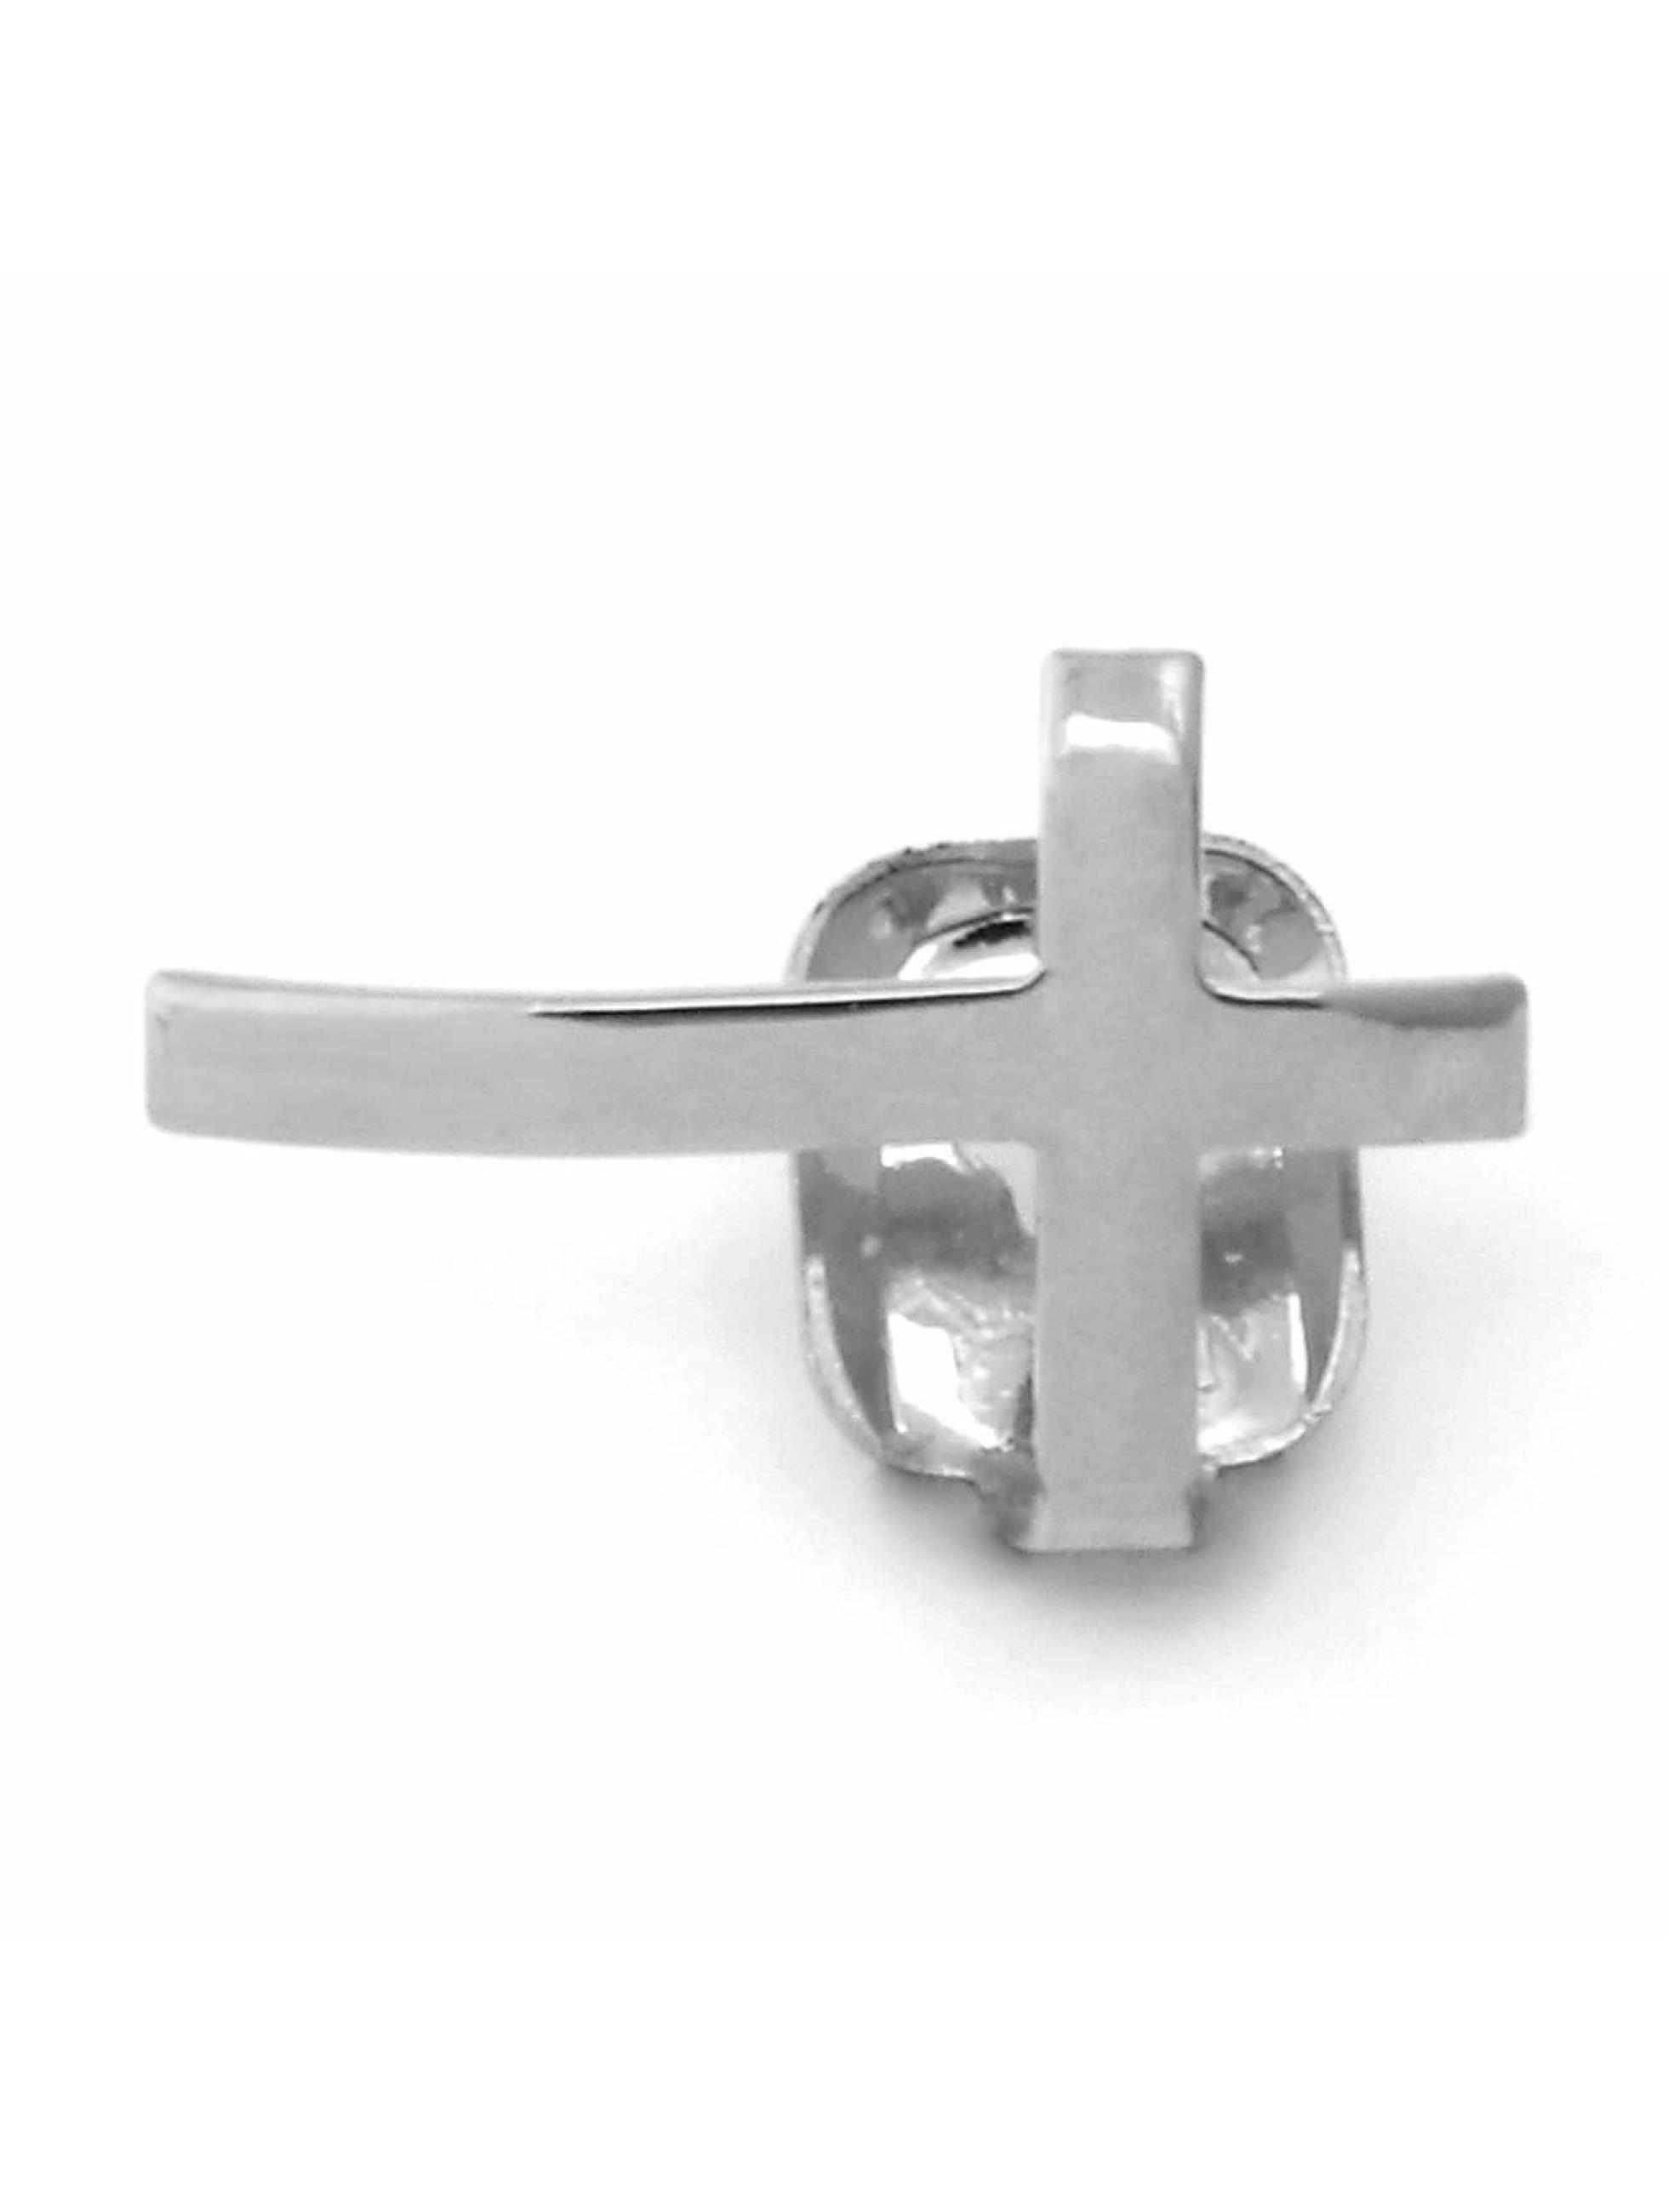 KING ICE Sonstige Rhodium_Plated Cross Single Tooth Cap Top silberfarben